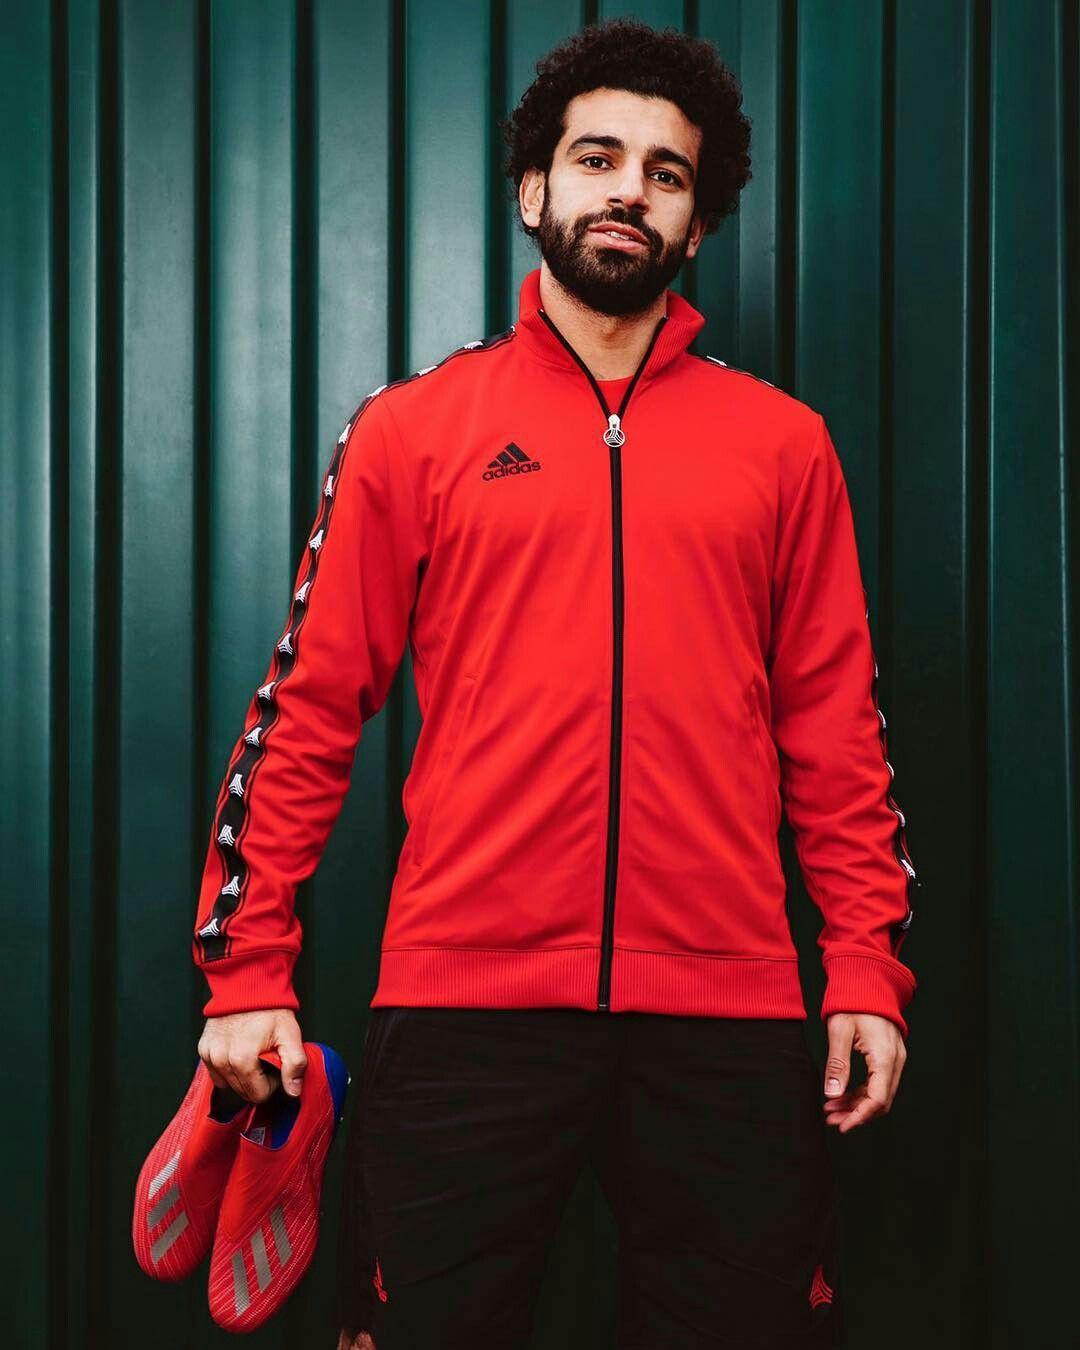 1a959aefa66f MoMo🔴 #Adidas | S A L A H | Mohamed salah, Mo salah, Peyton meyer